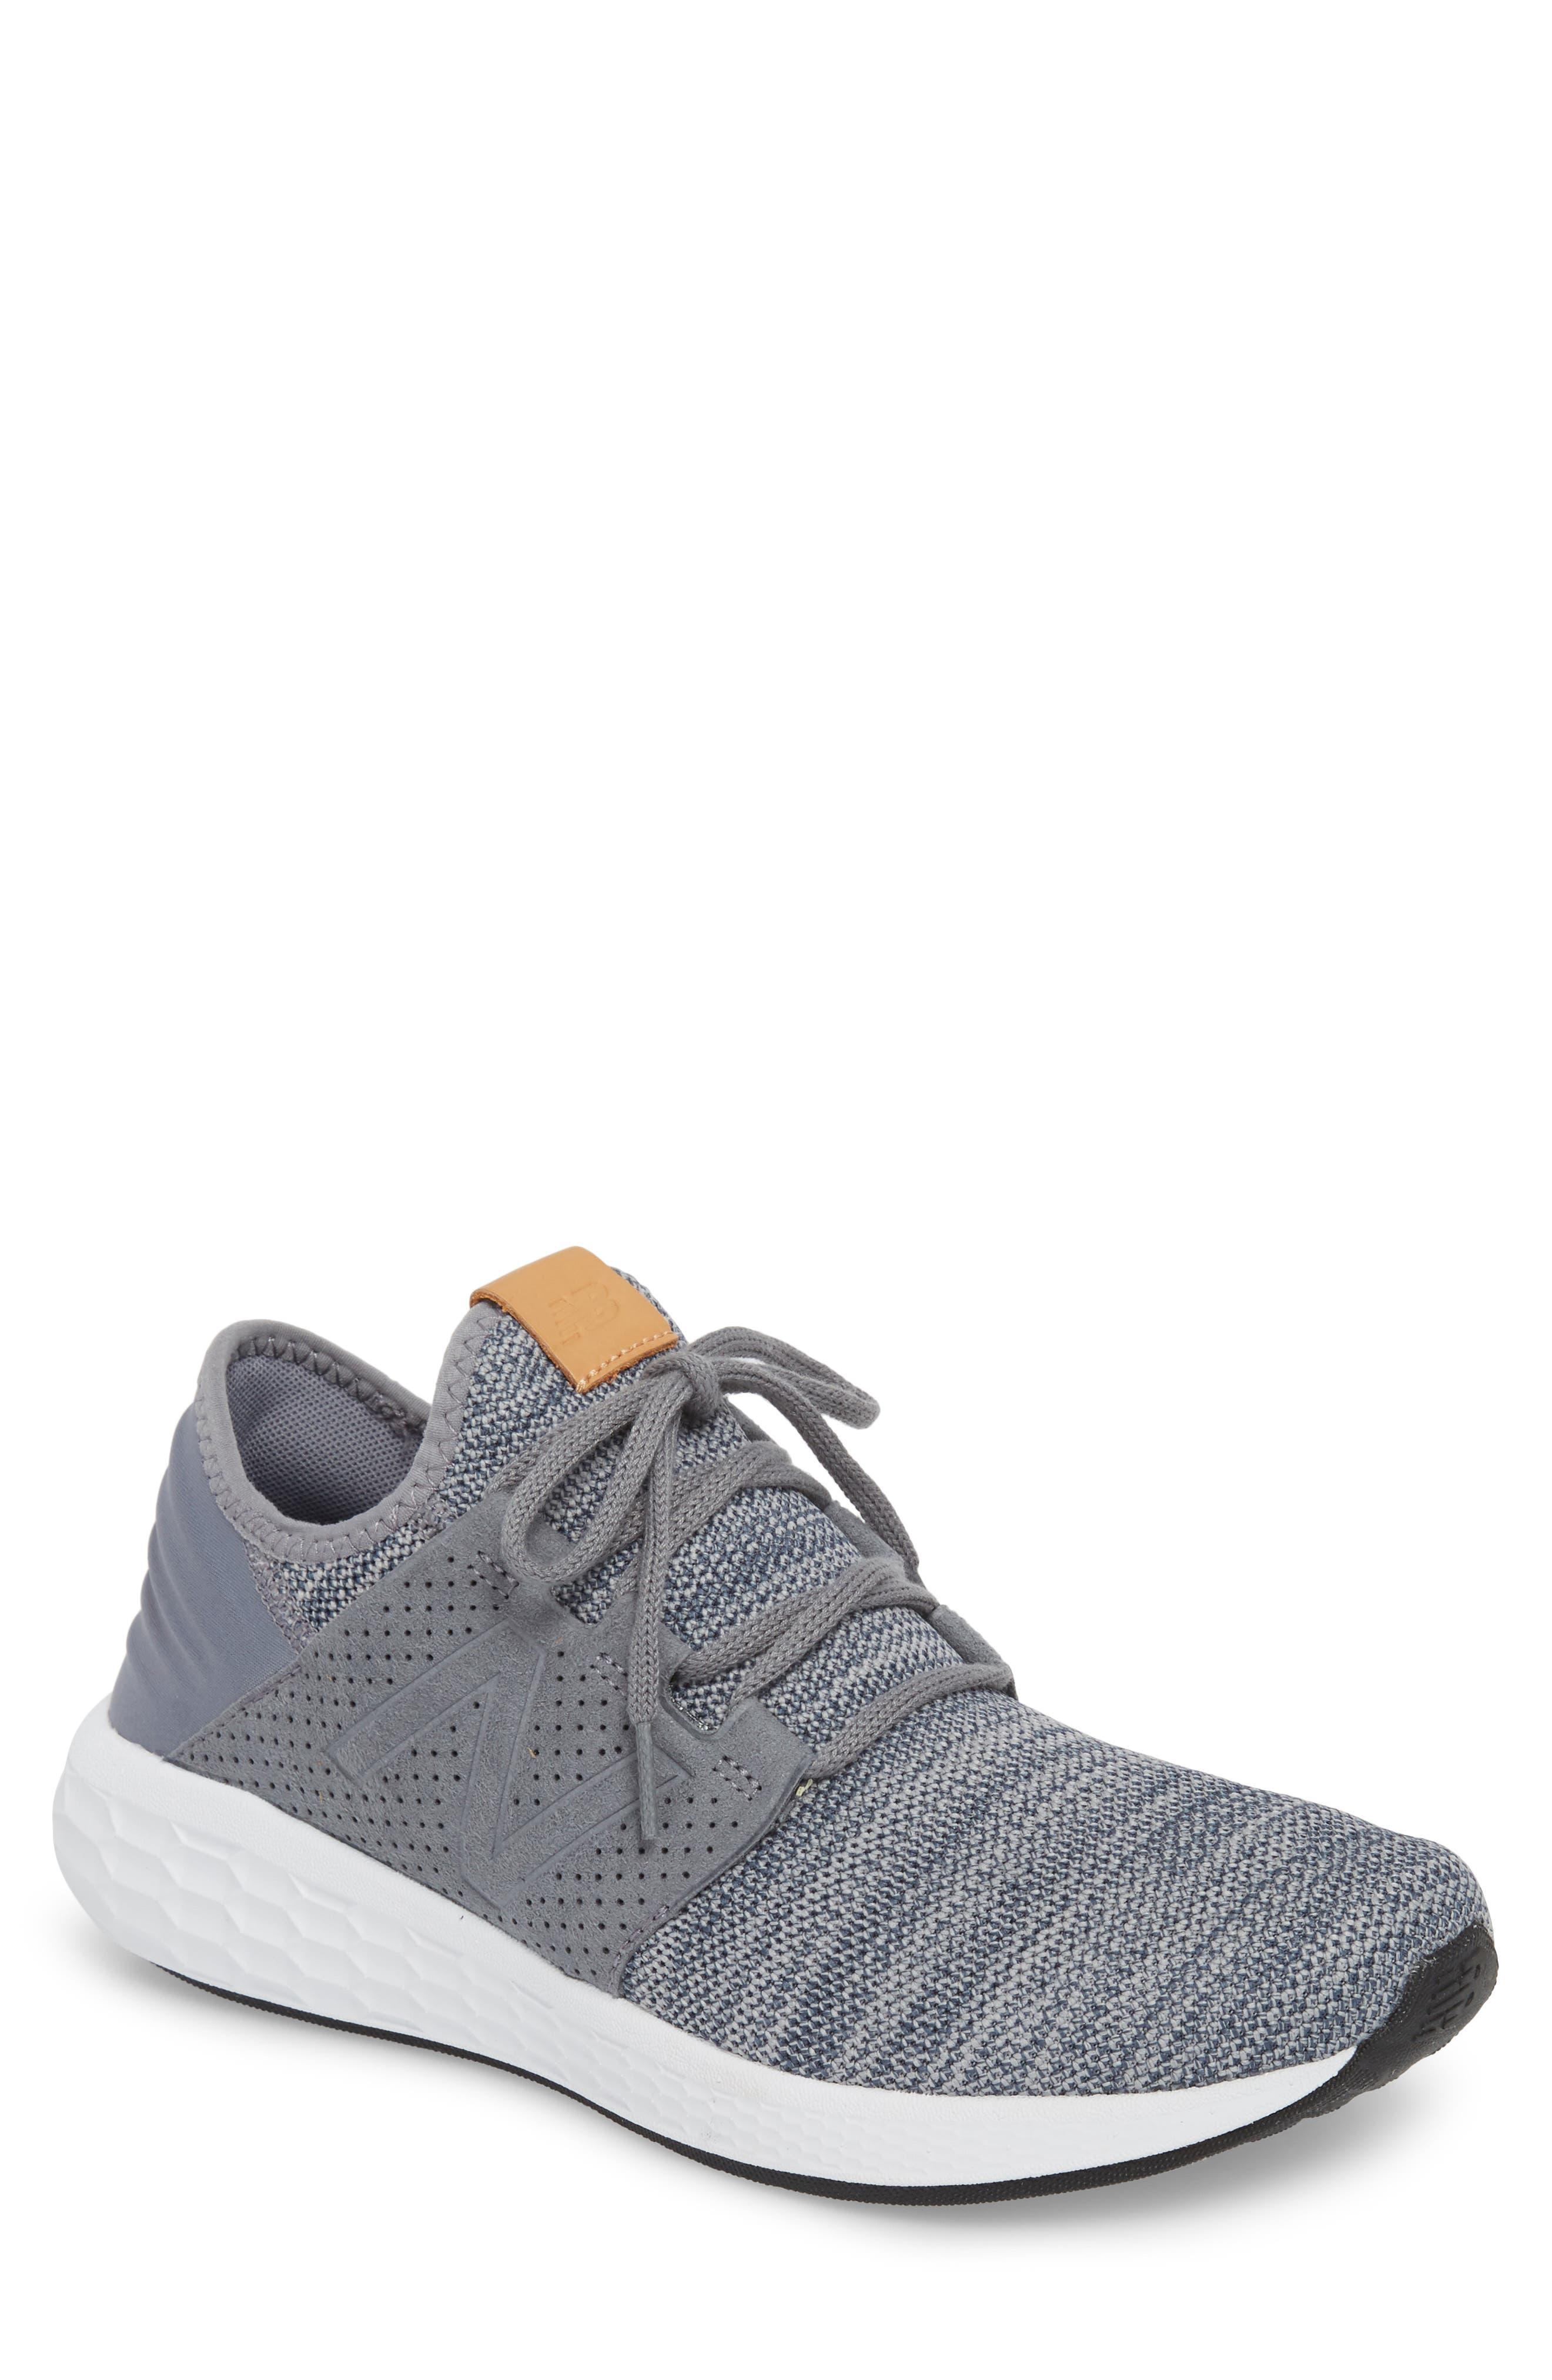 Fresh Foam Cruz v2 Knit Running Shoe,                         Main,                         color, GUNMETAL